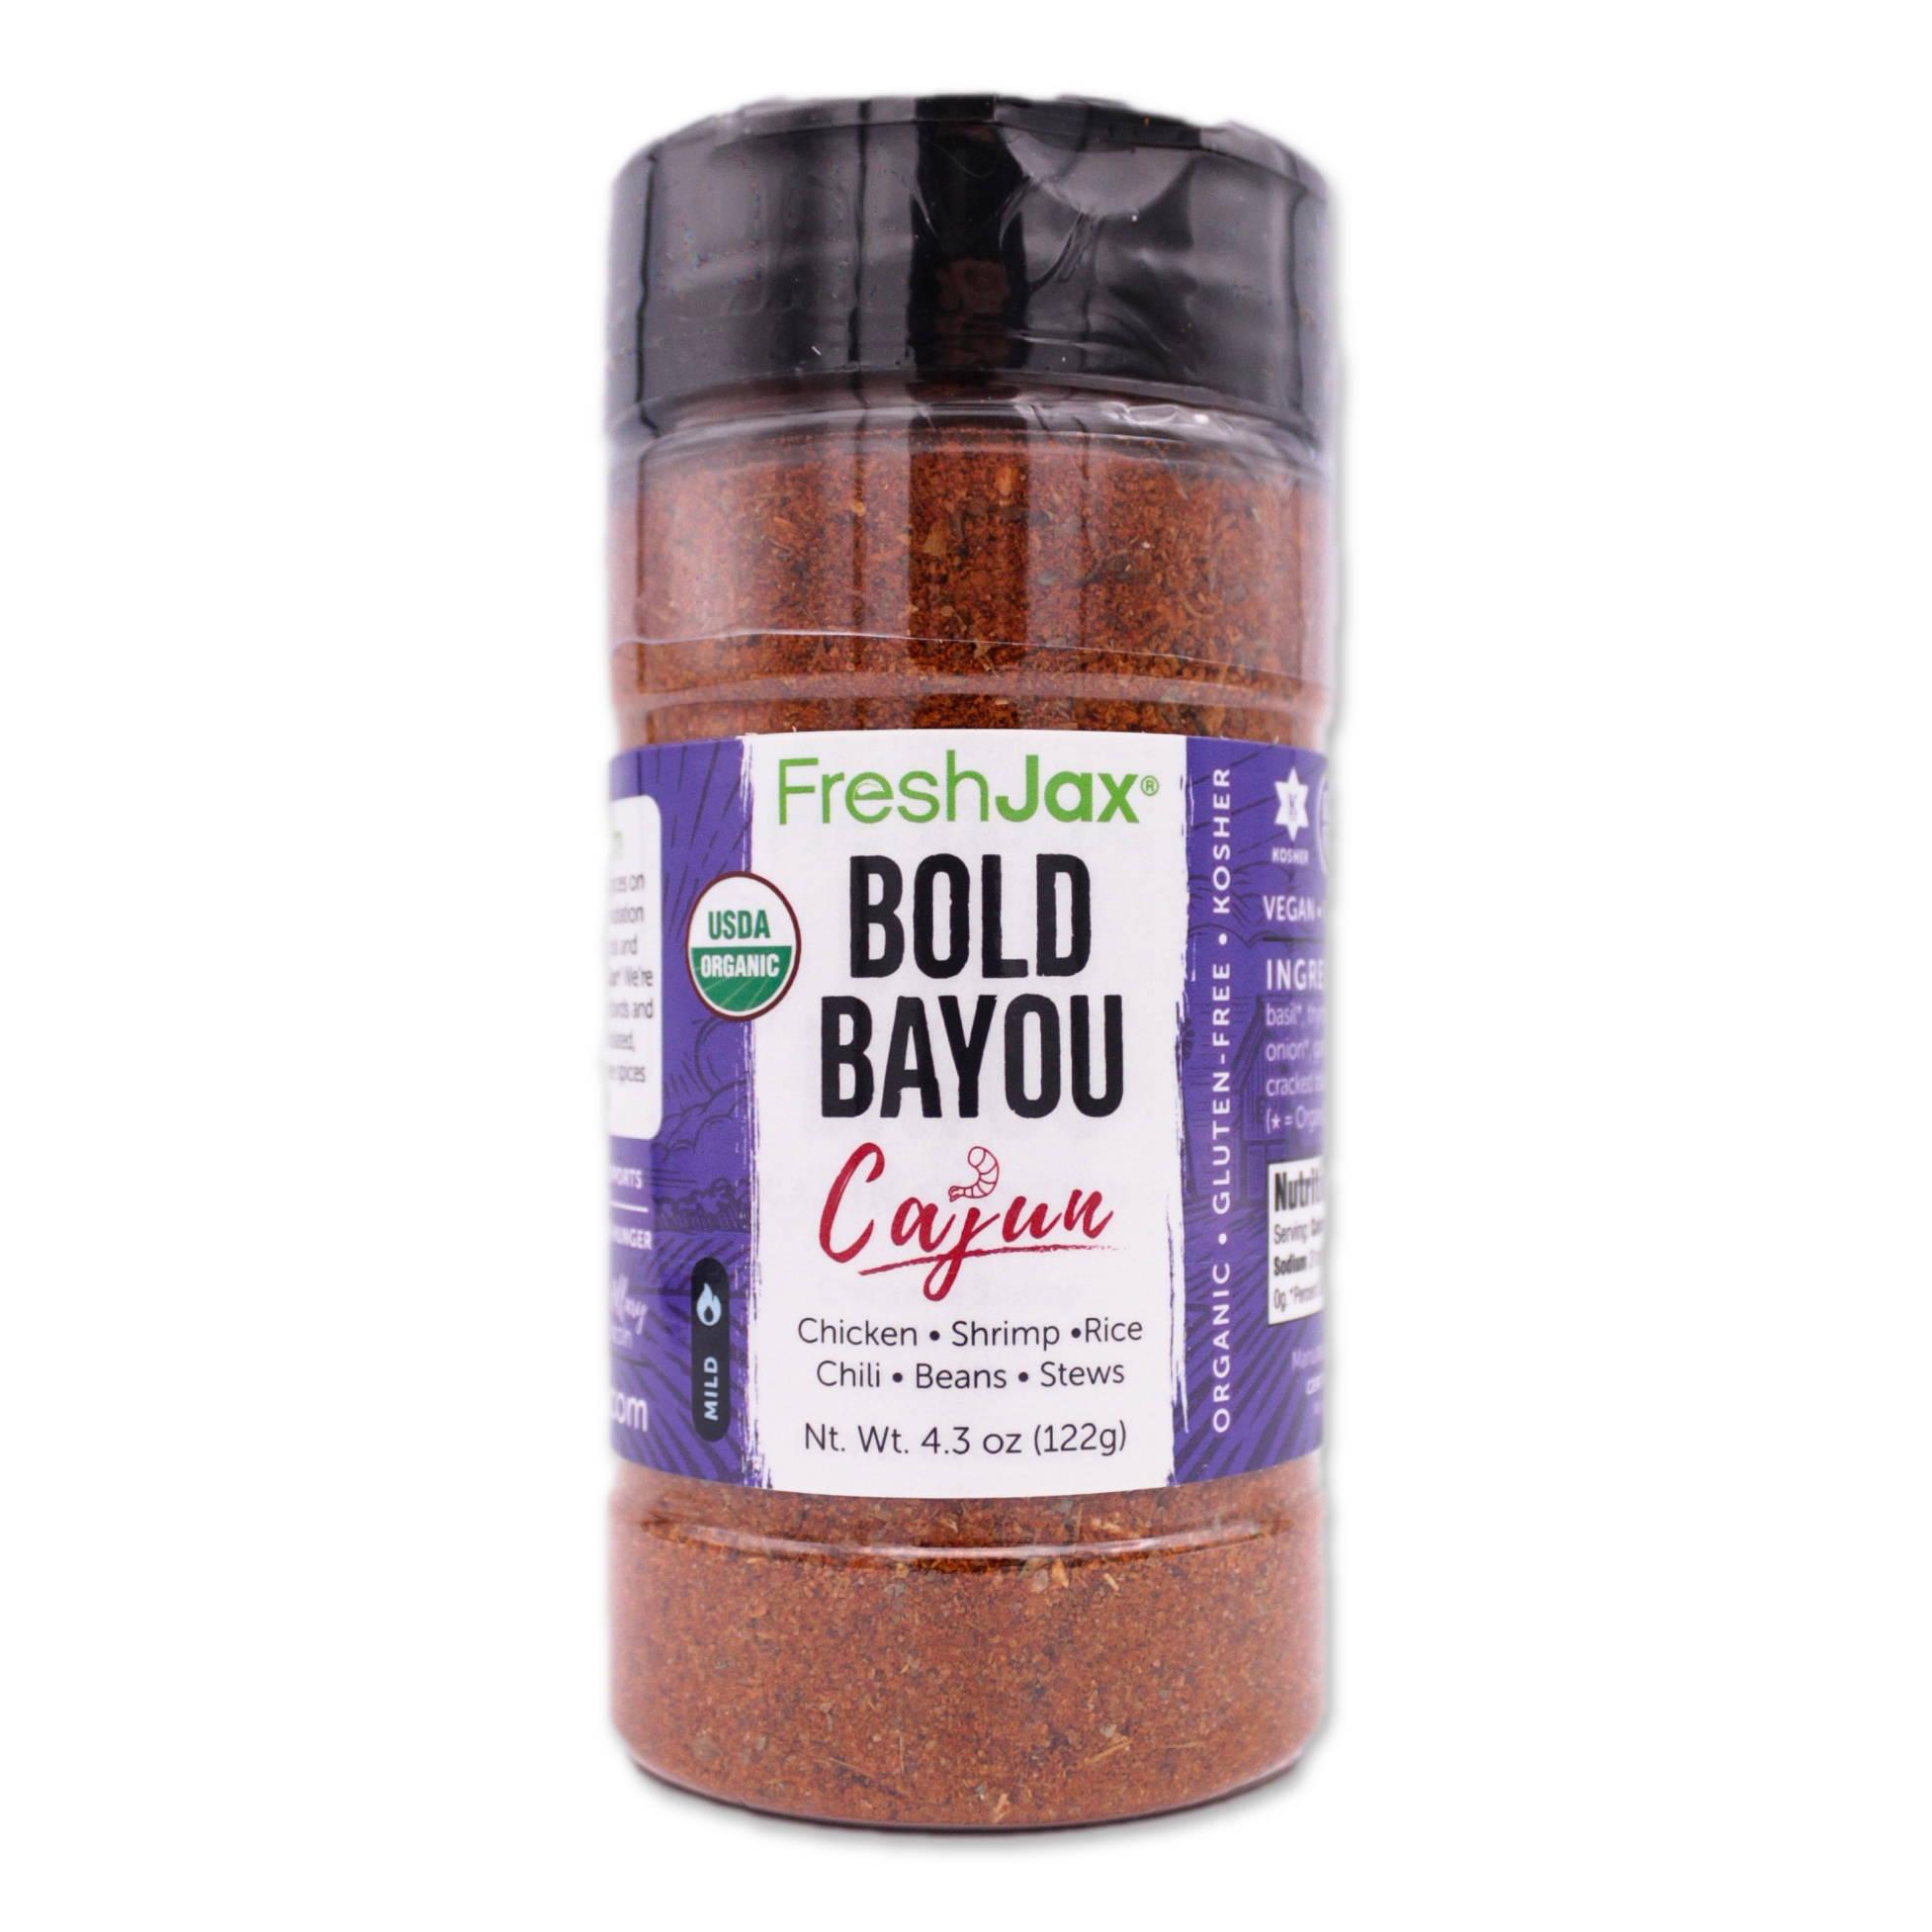 FreshJax  Organic Spices Bold Bayou Cajun Seasoning large bottle